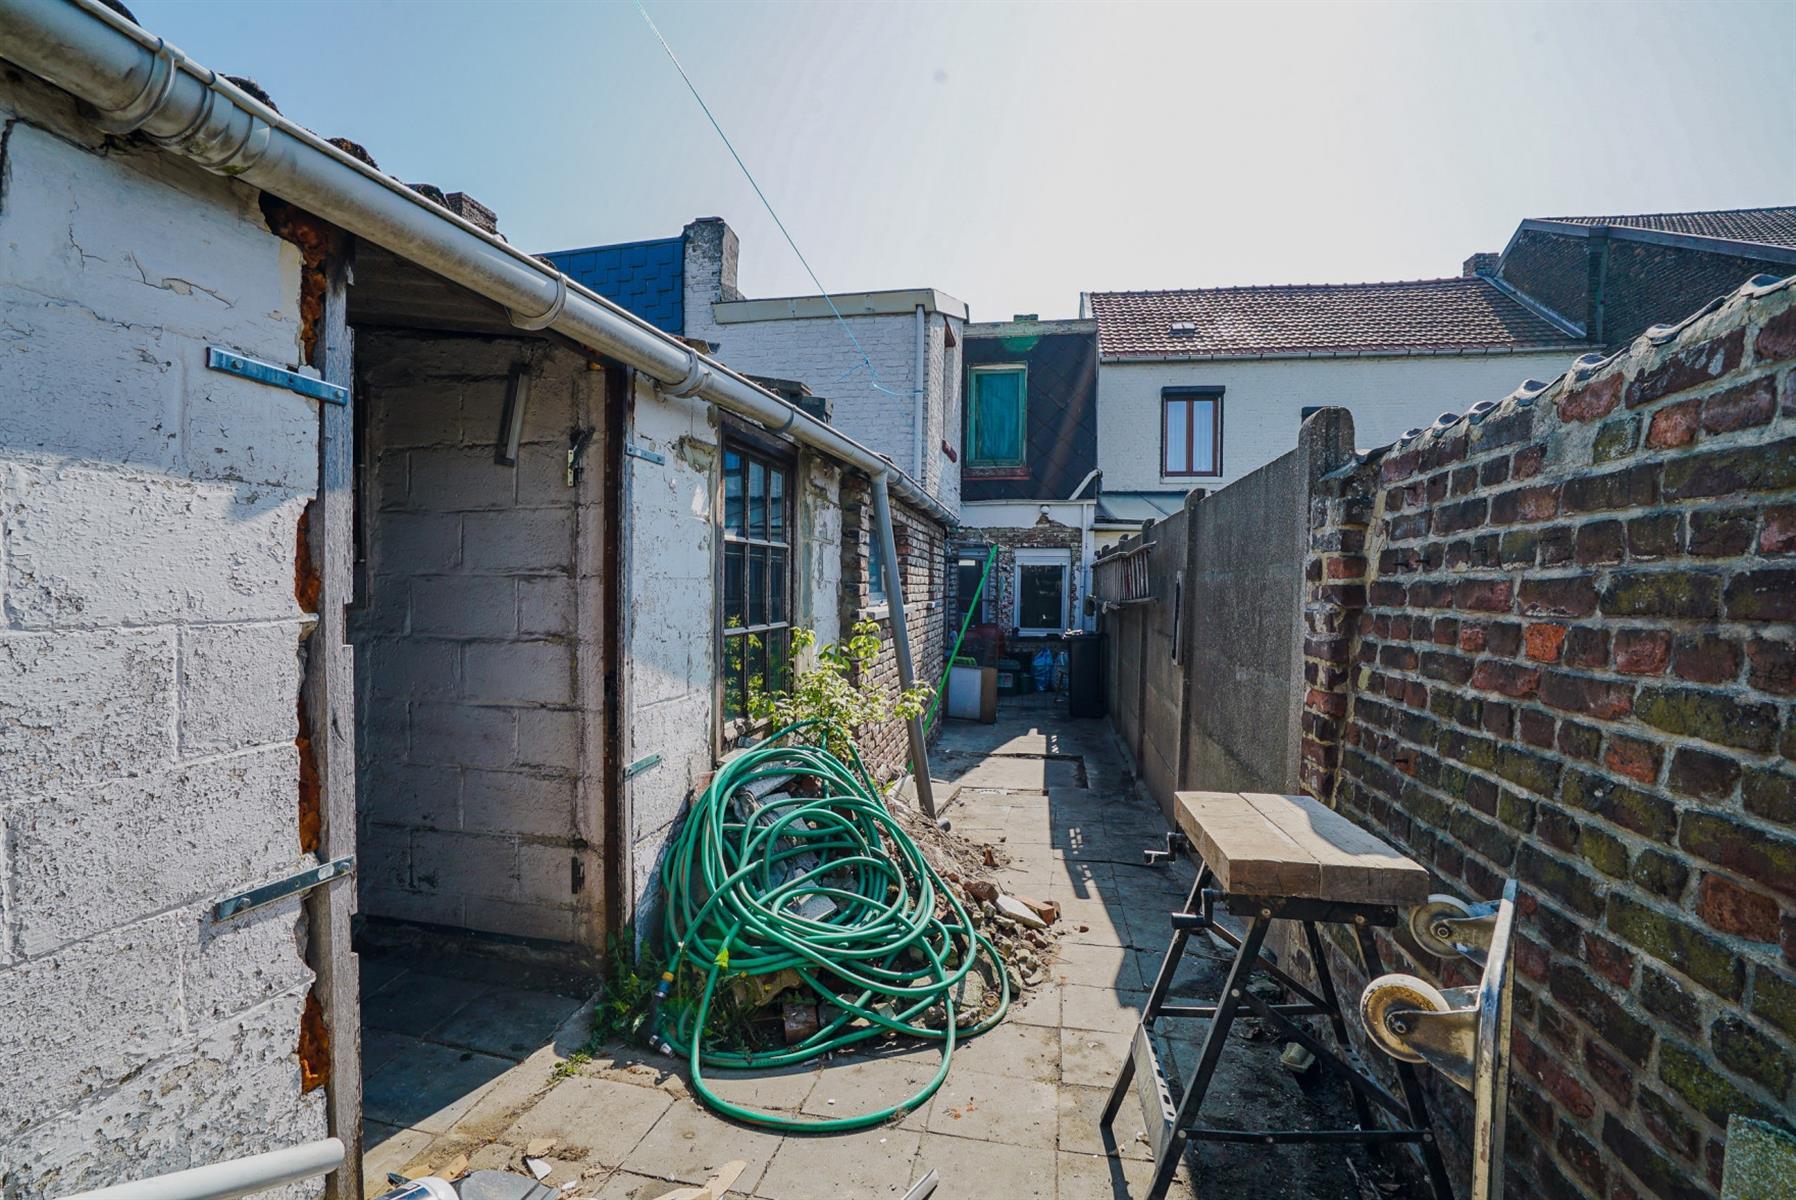 Maison - Oupeye Hermallesous-Argenteau - #4324098-14